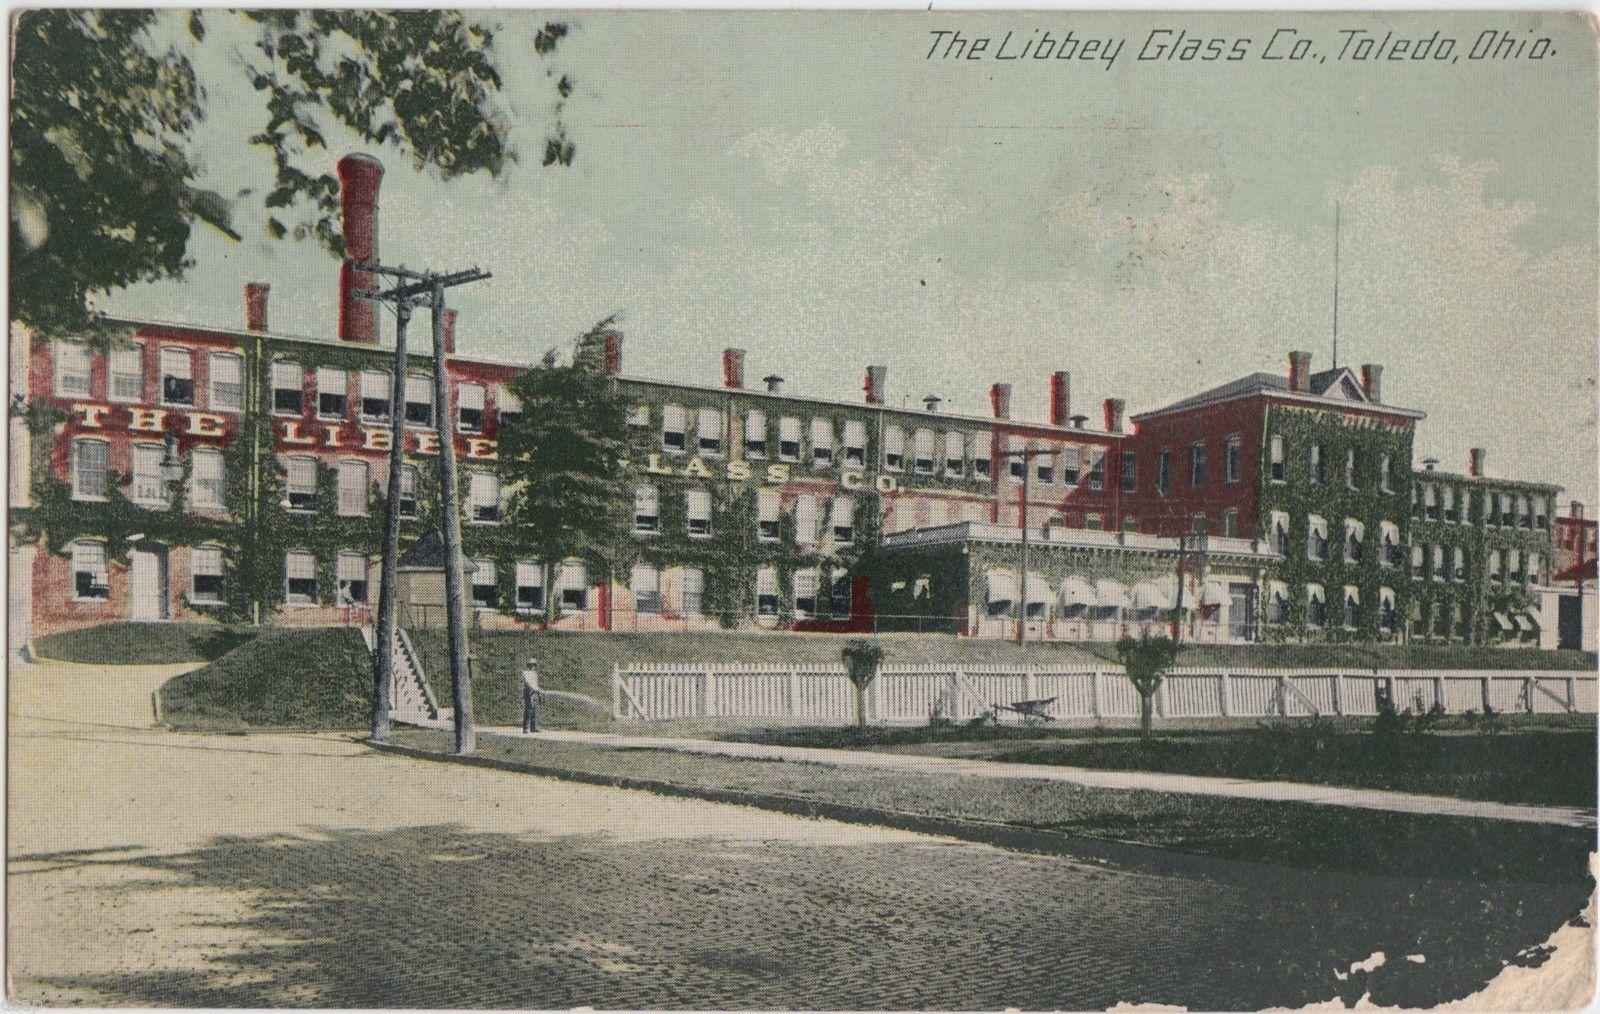 C1910 Toldeo Ohio Postcard Libbey Glass Company Factory Toledo